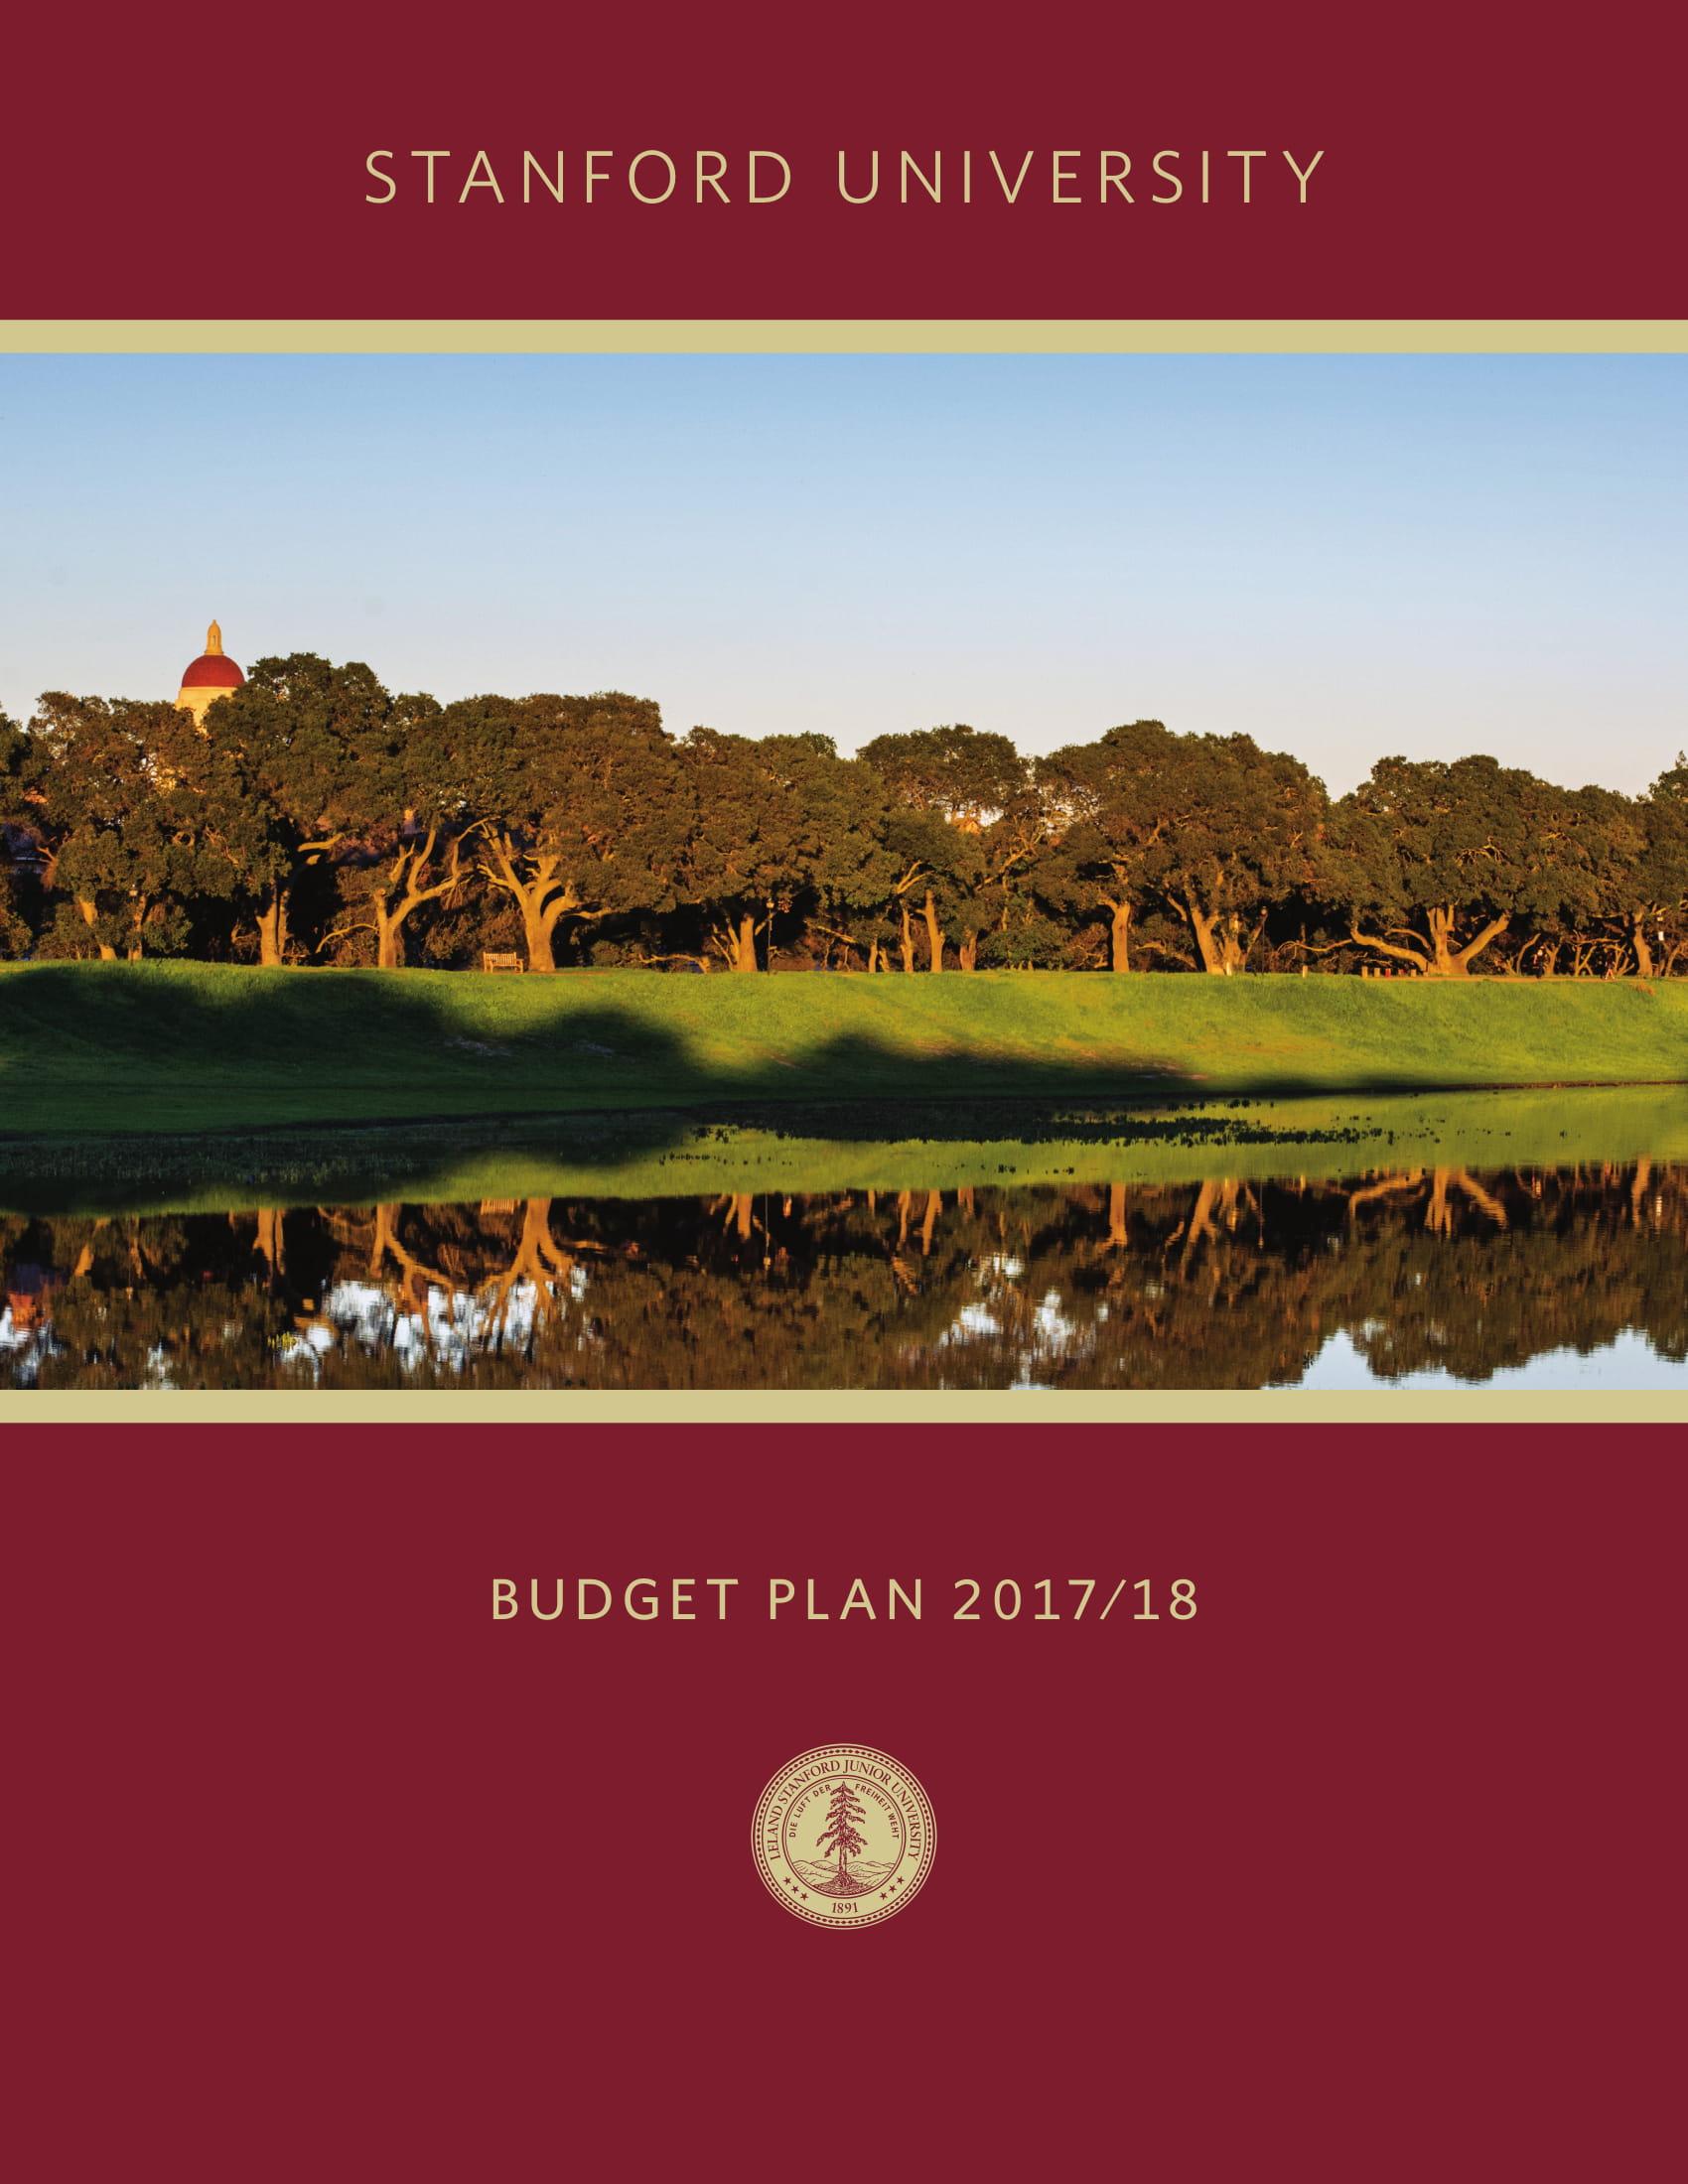 budget plan executive summary example 01